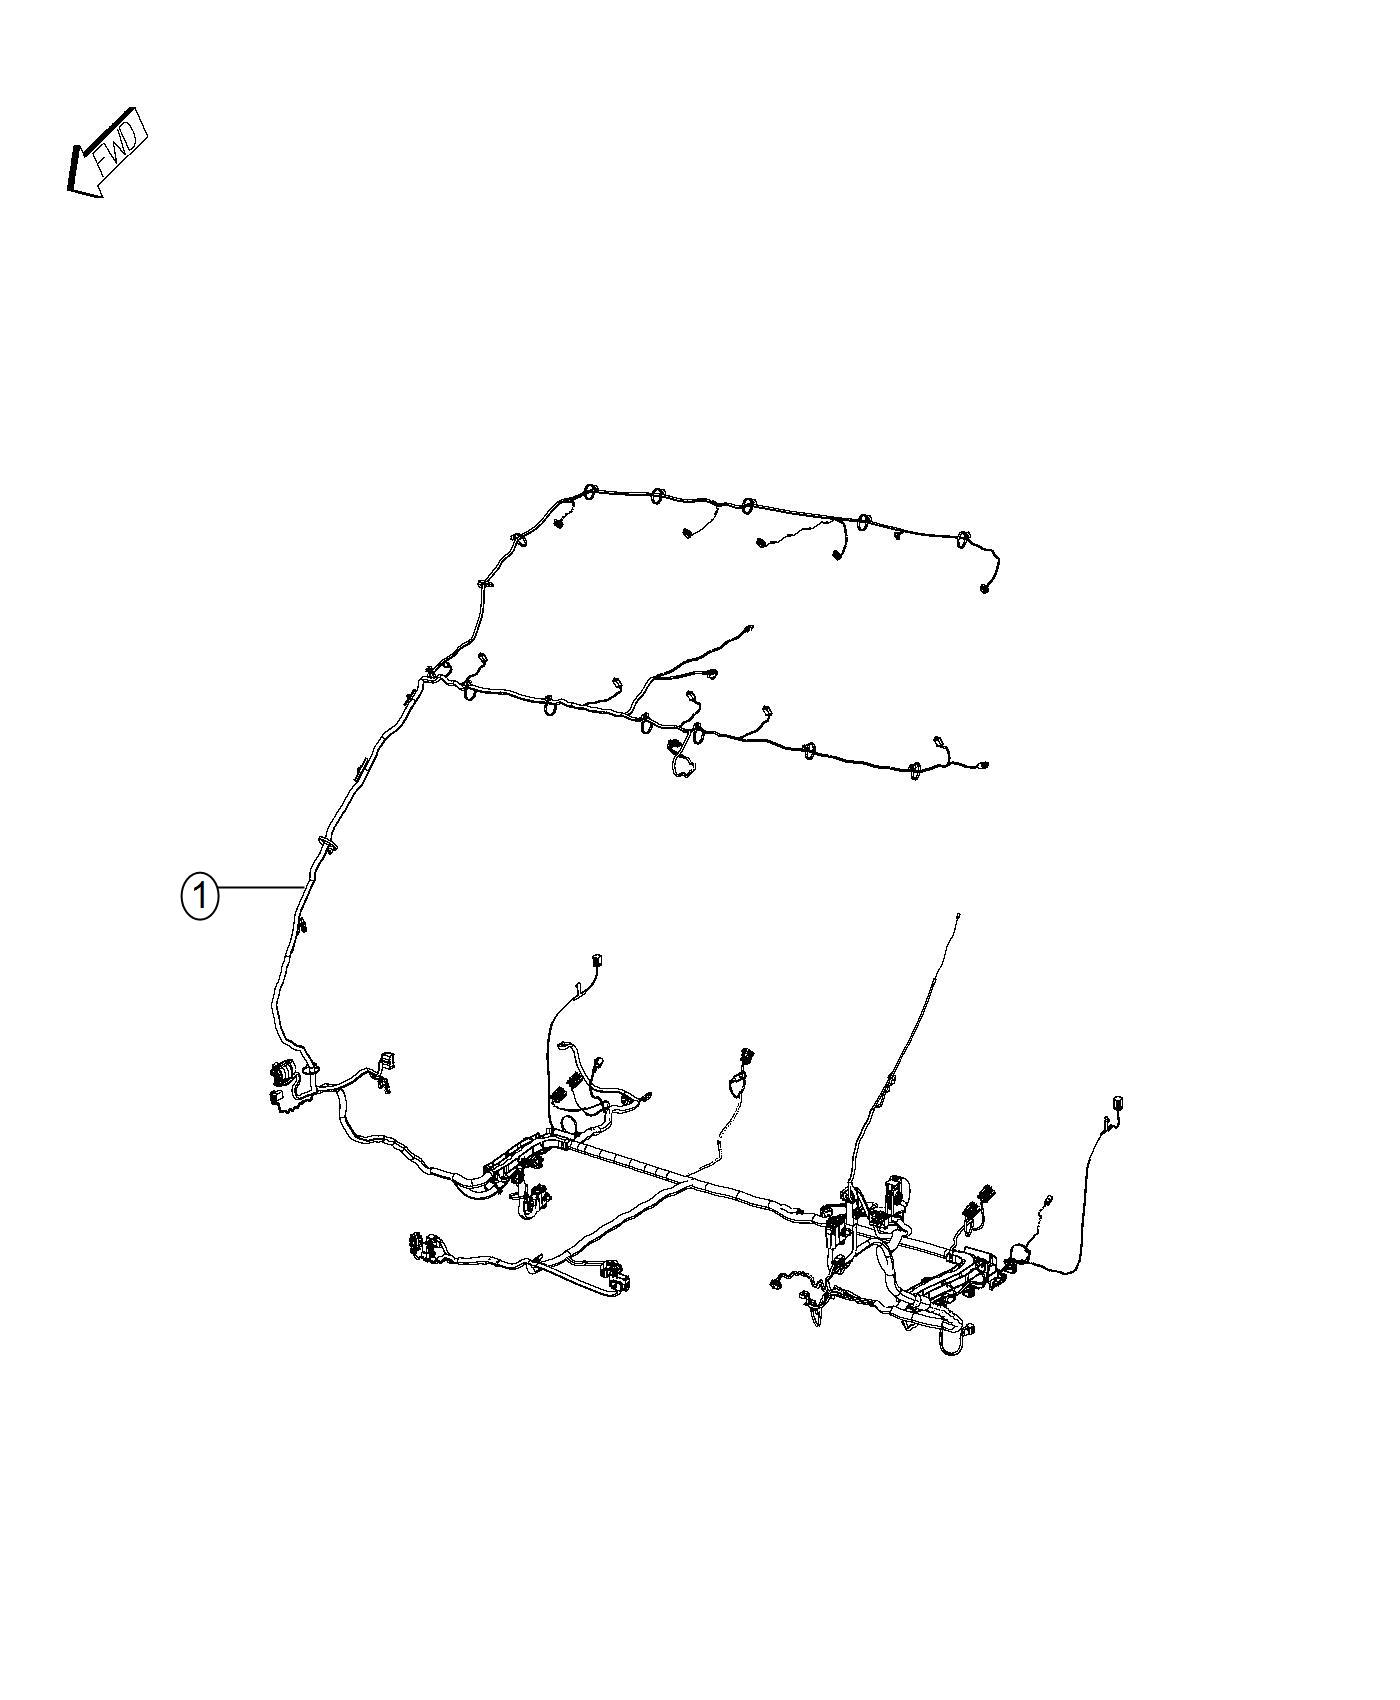 Ram ProMaster Wiring. Body. Interior. [delete passenger